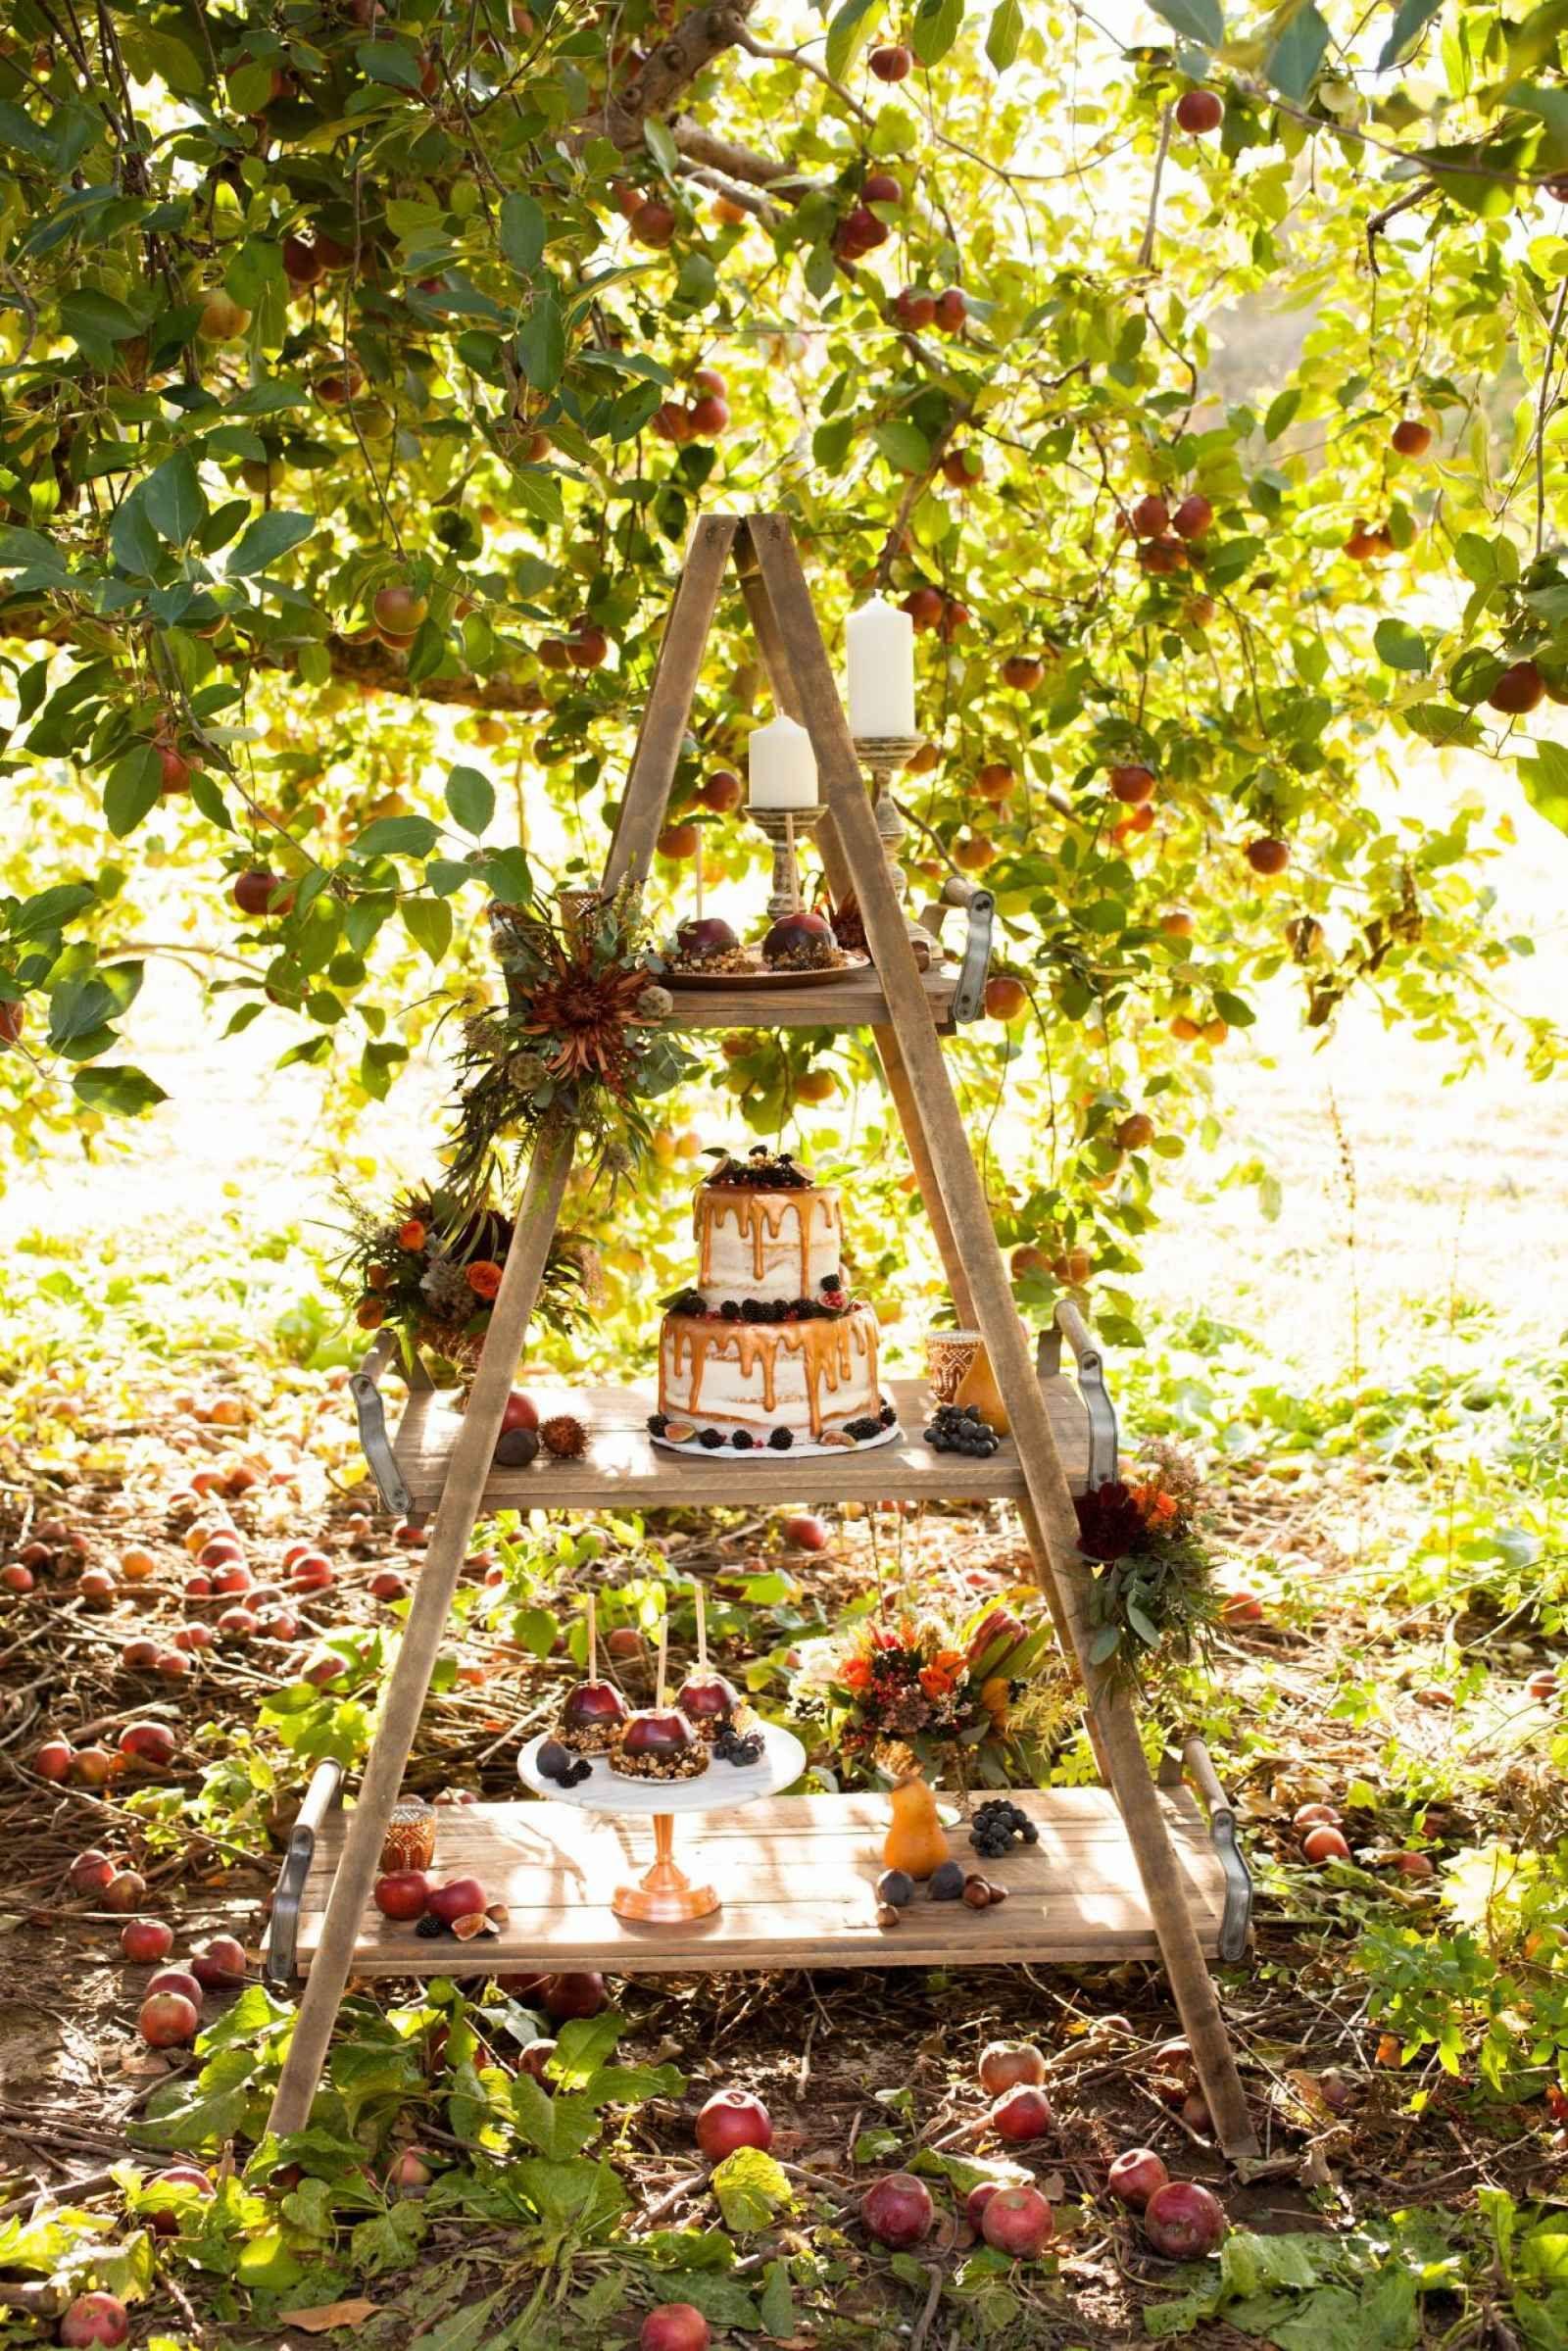 Fall wedding cake and dessert display for outdoor wedding